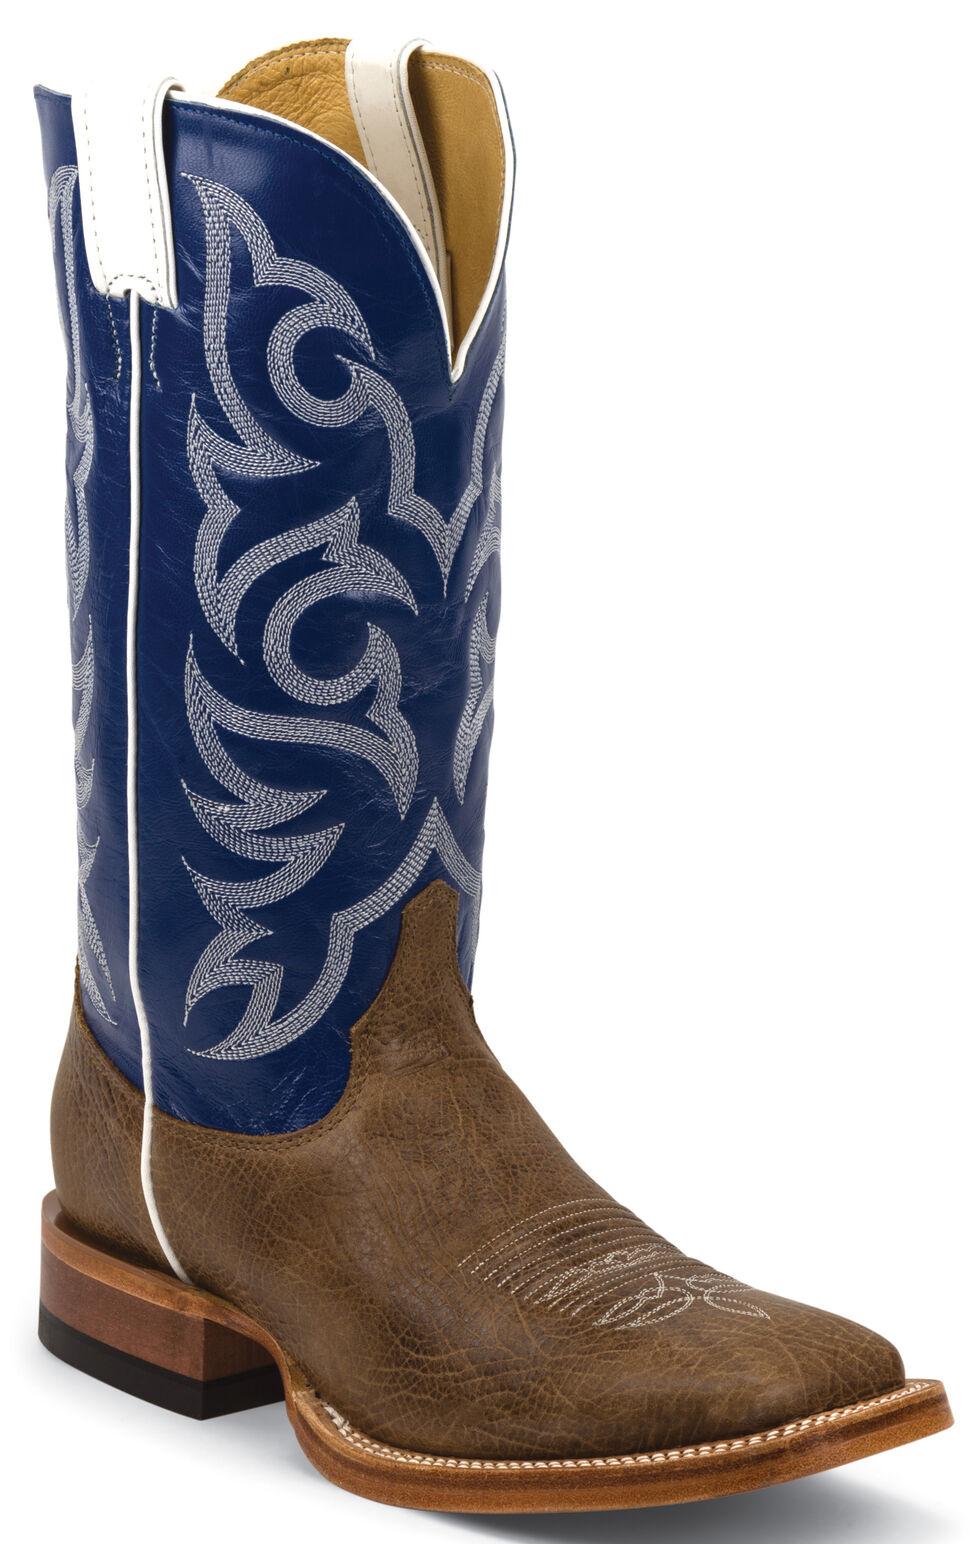 Justin Brown Delta Cowhide Cowboy Boots - Square Toe, Brown, hi-res